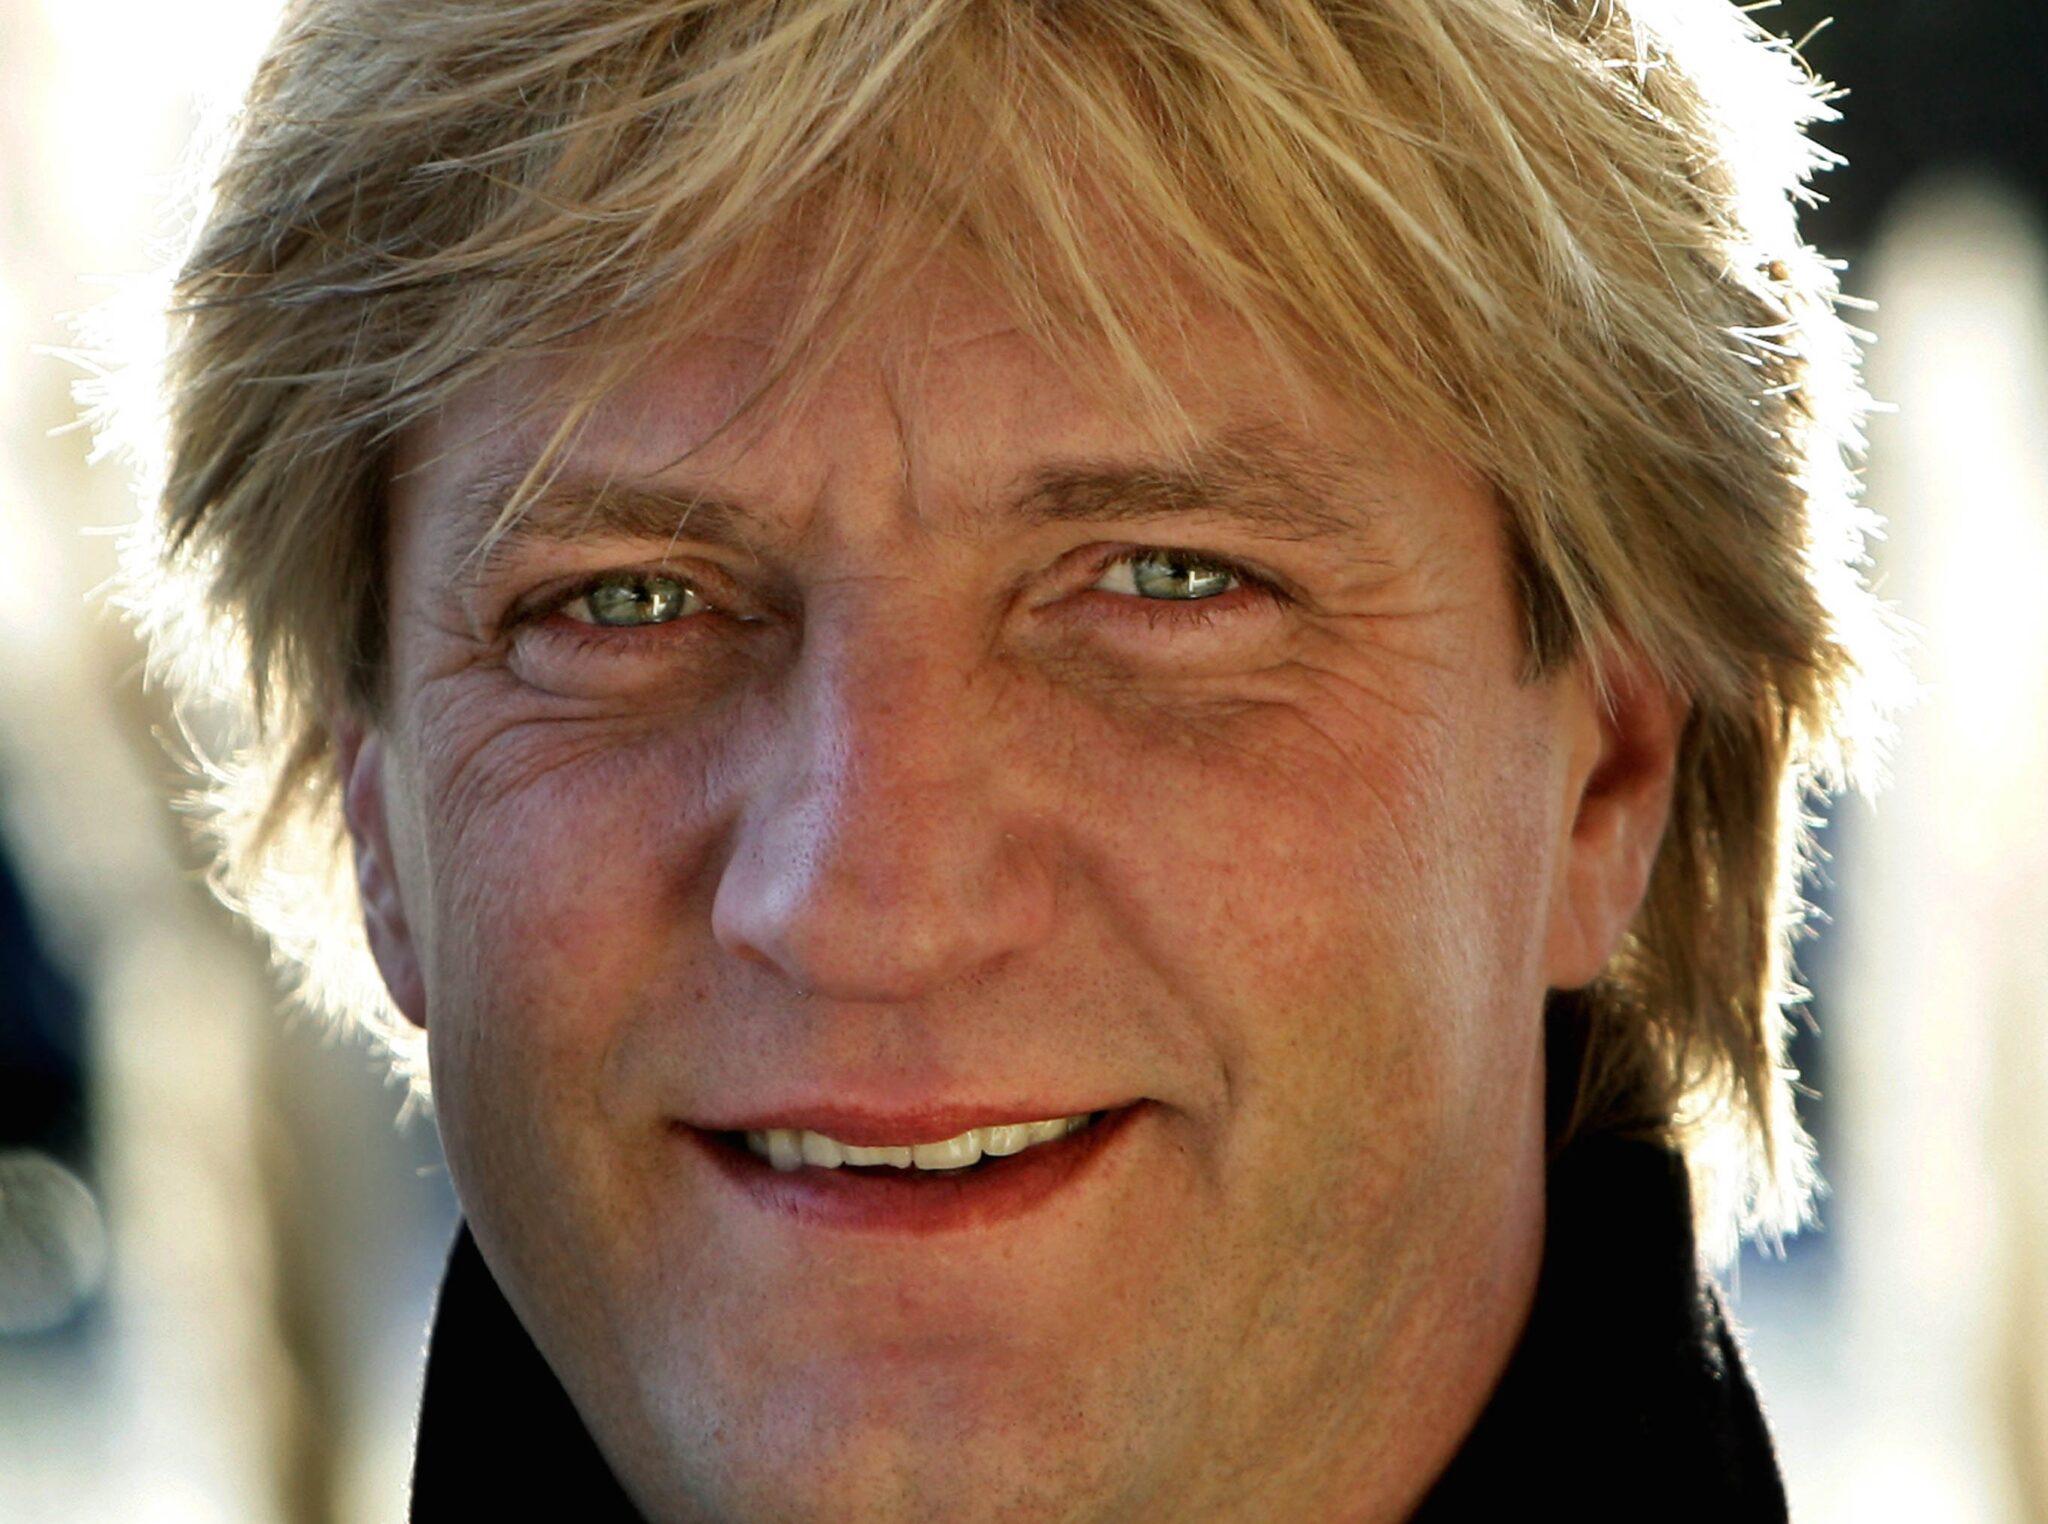 Ex Profvoetballer Voetbalanalist En Televisiebekendheid Ontmoet Wim Kieft Op Vaderdag Indebuurt Breda